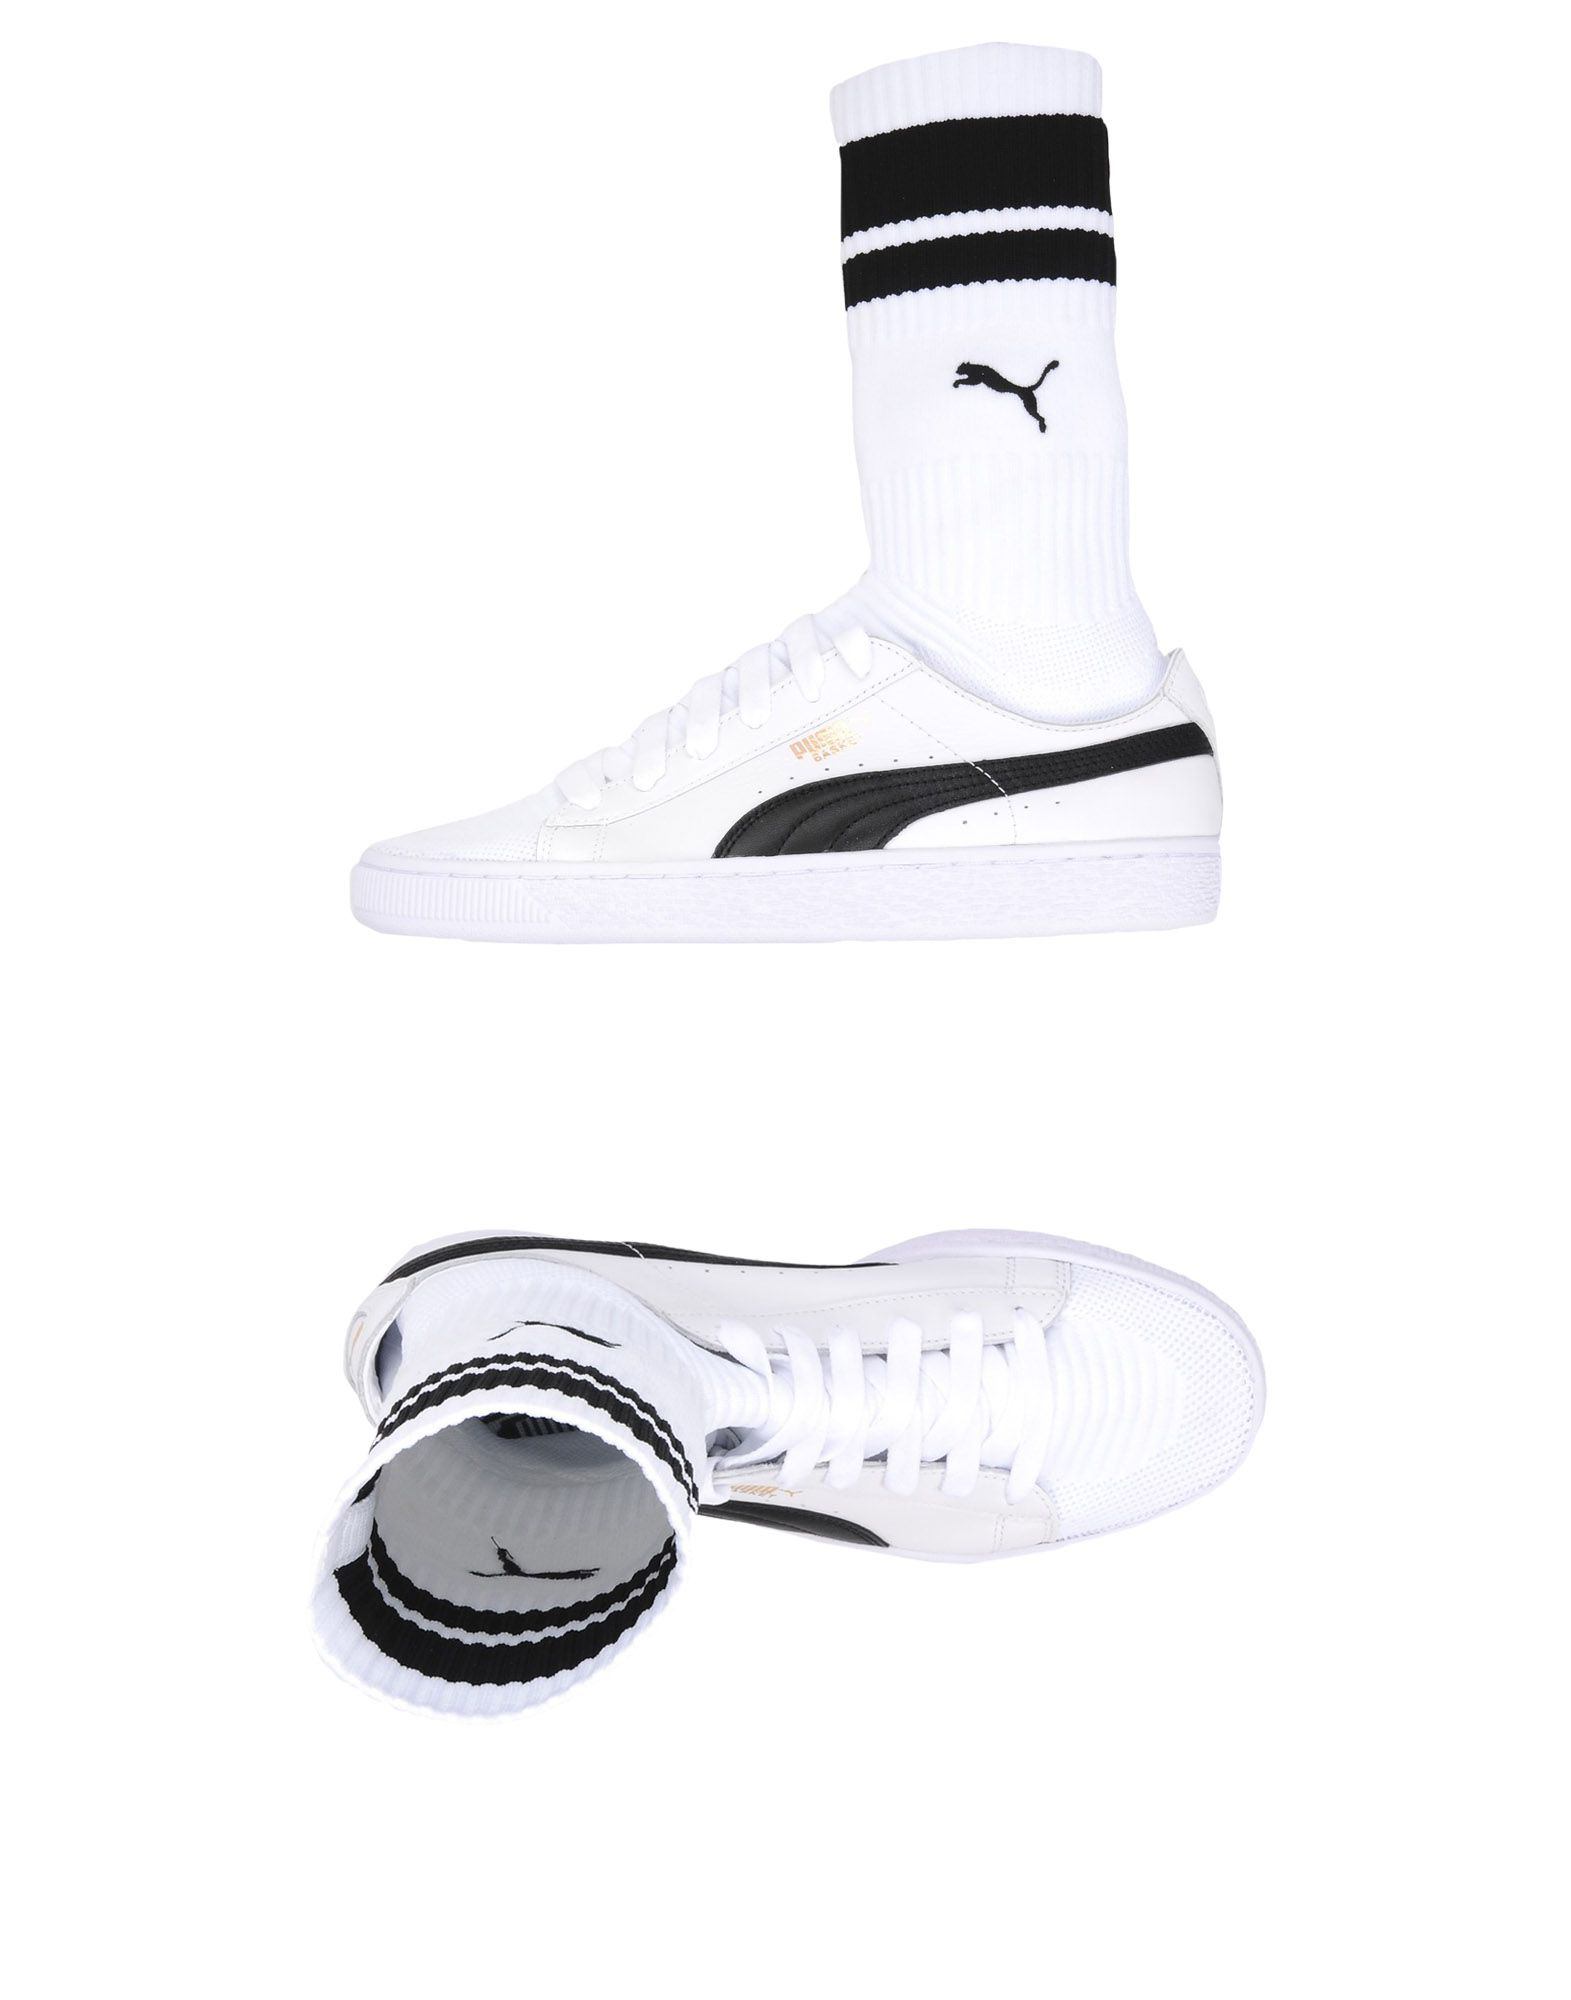 Sneakers Puma Basket Sock Evoknit Wns - Donna - Acquista online su